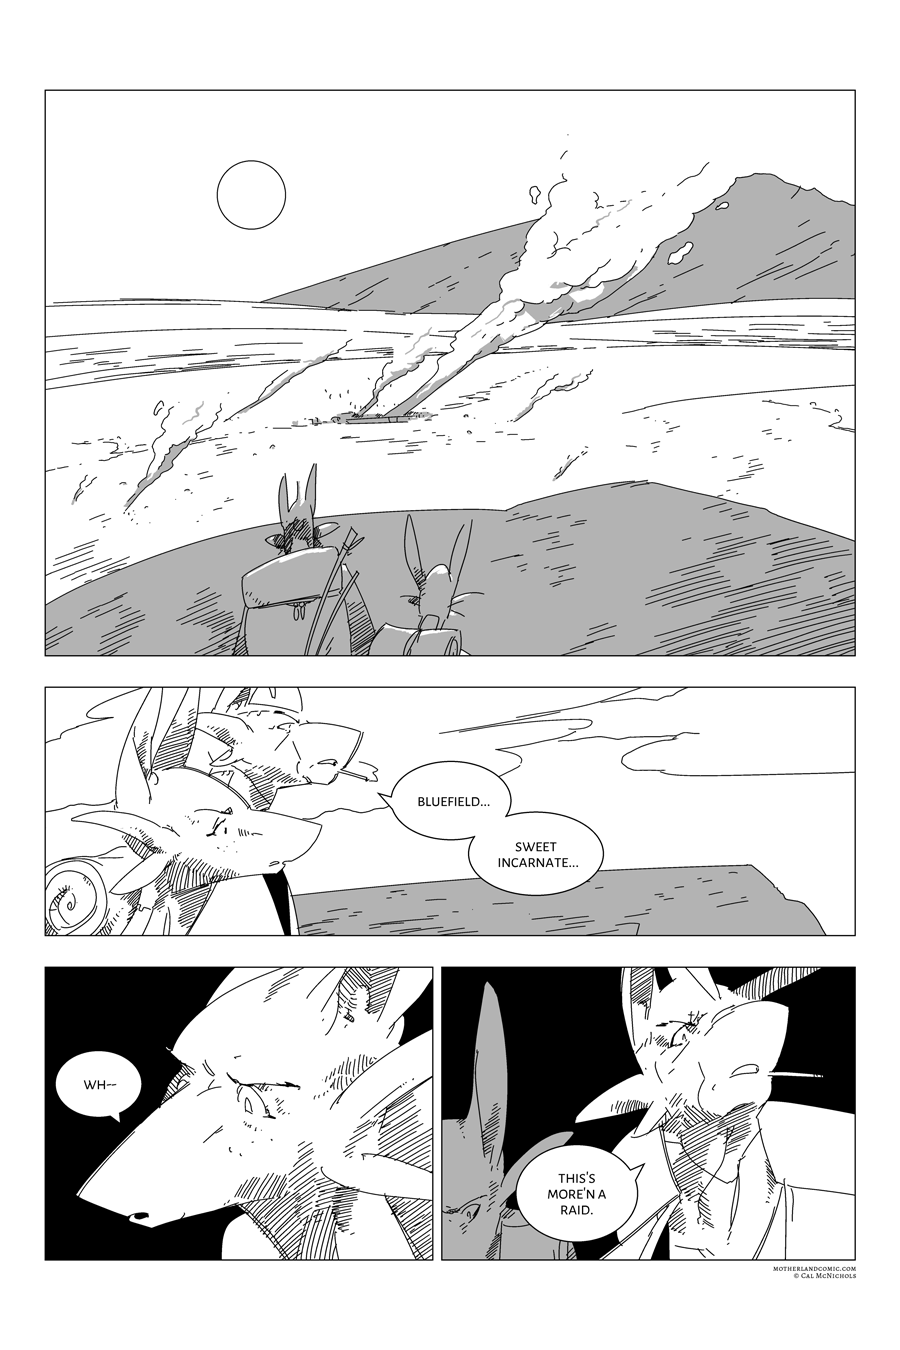 pg 83